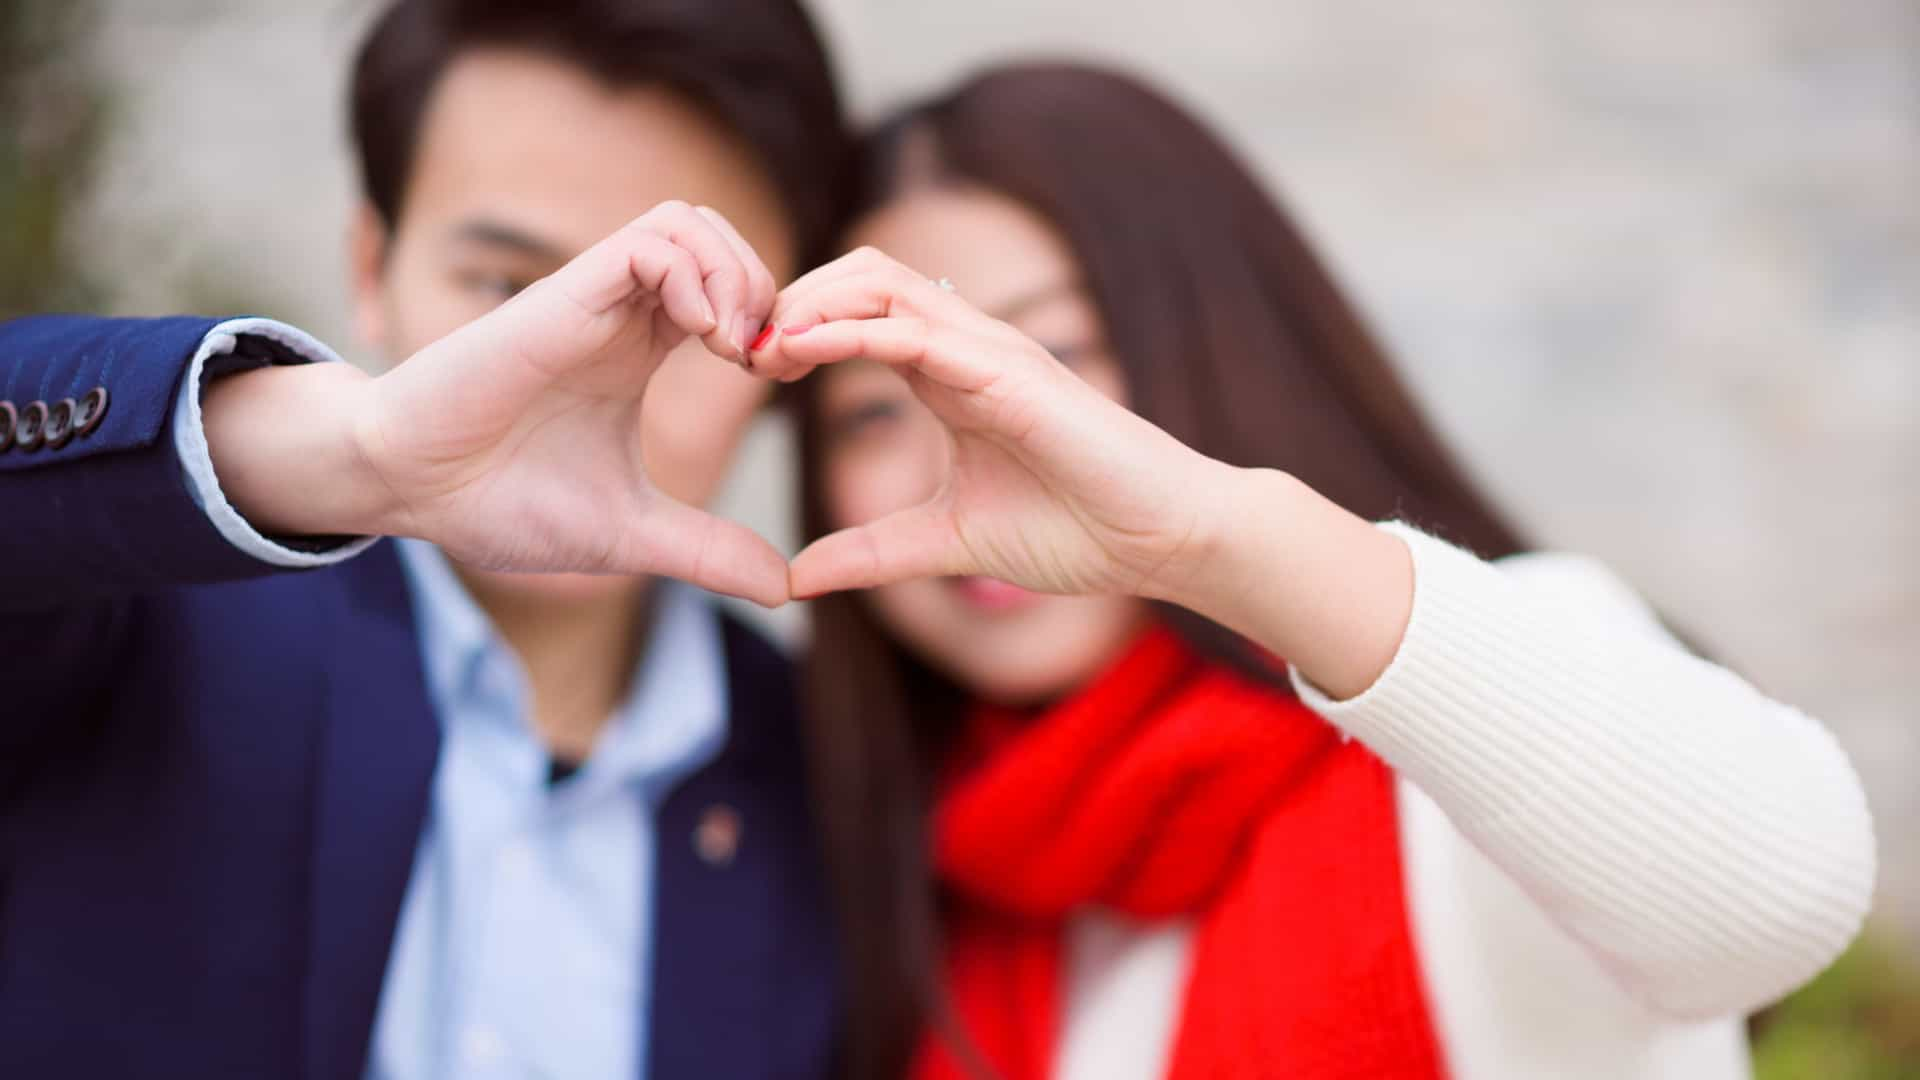 Acabar o namoro na China pode ser caro